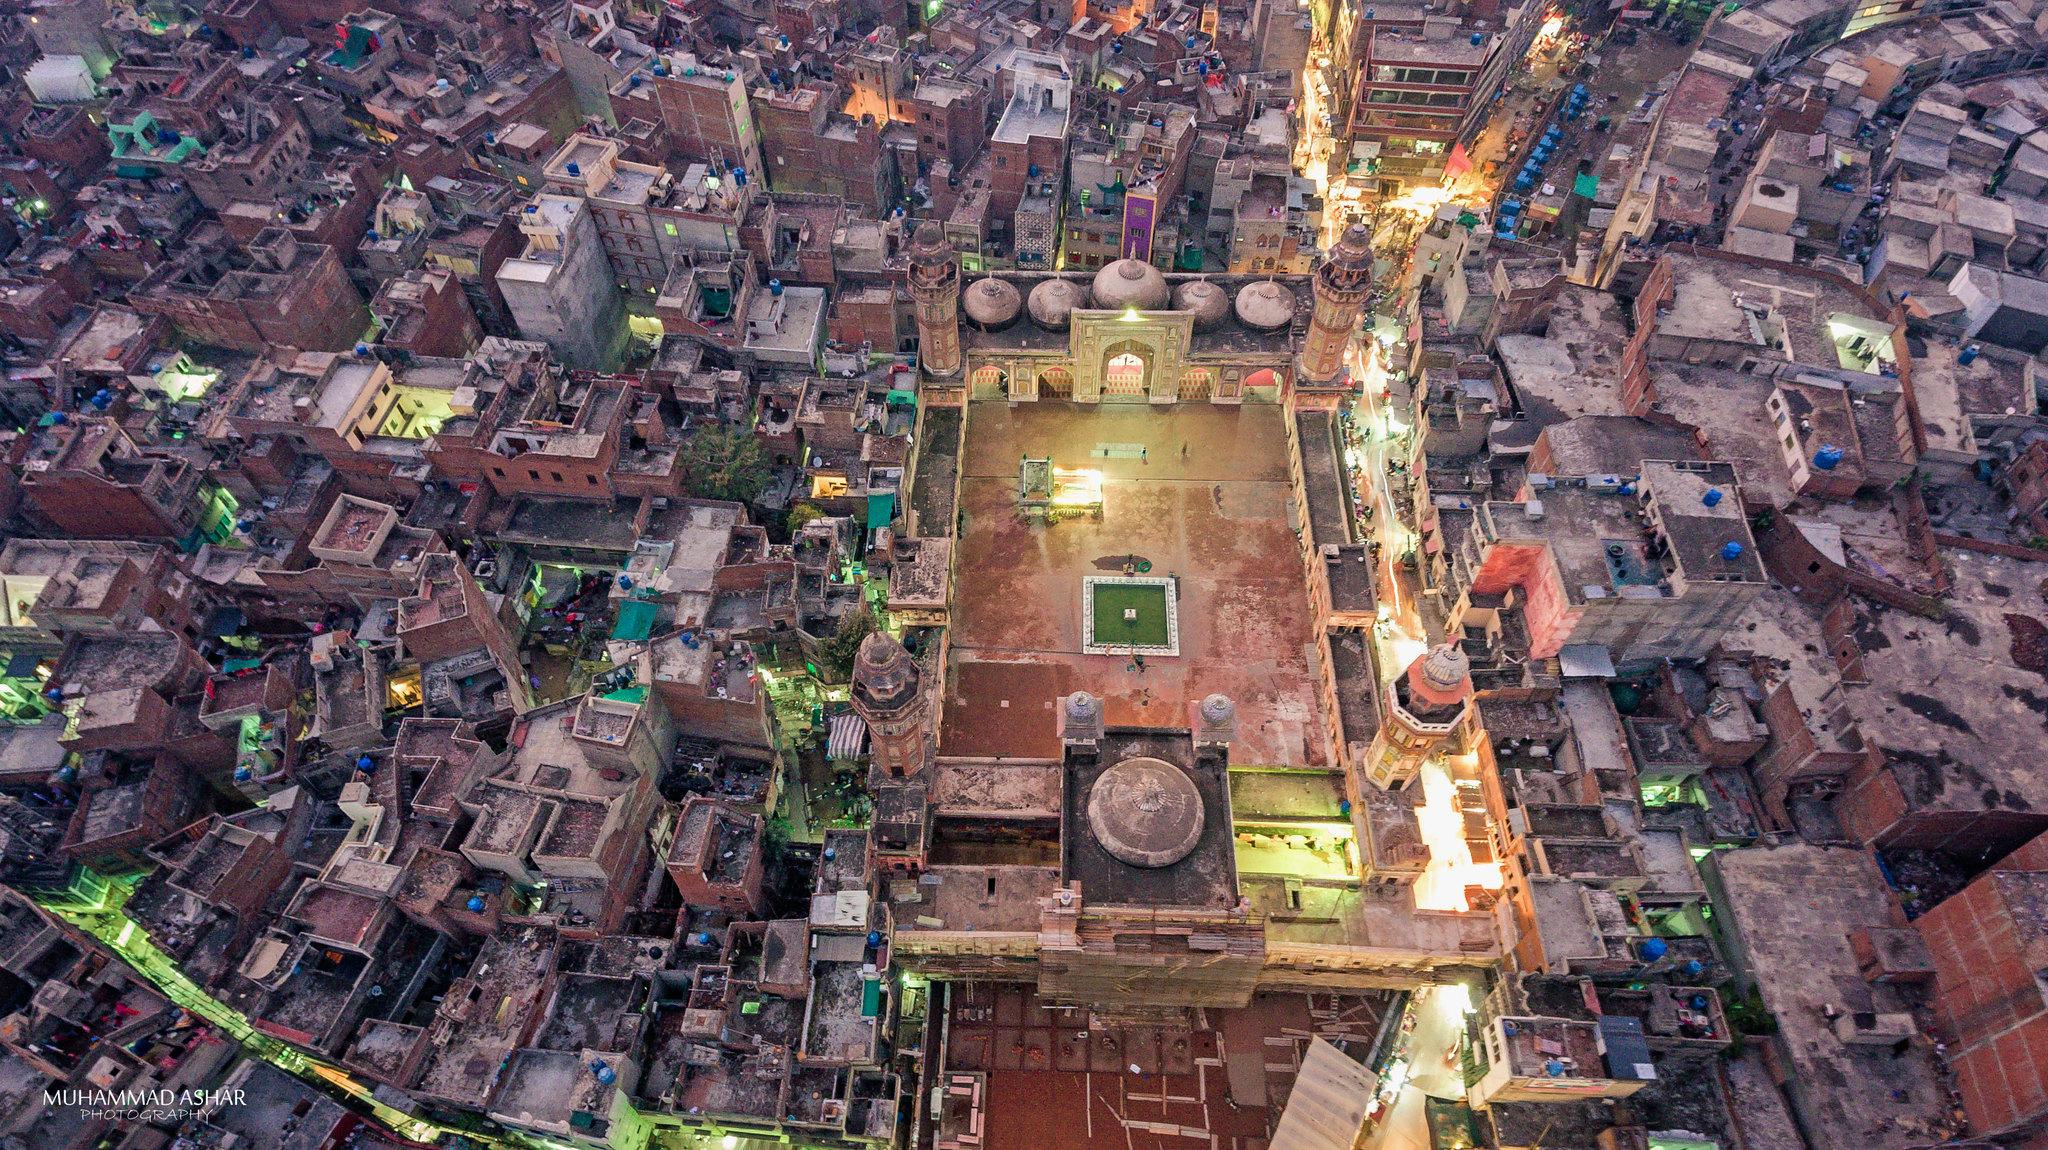 Bird's Eye View of the Wazir Khan Mosque, Walled City of